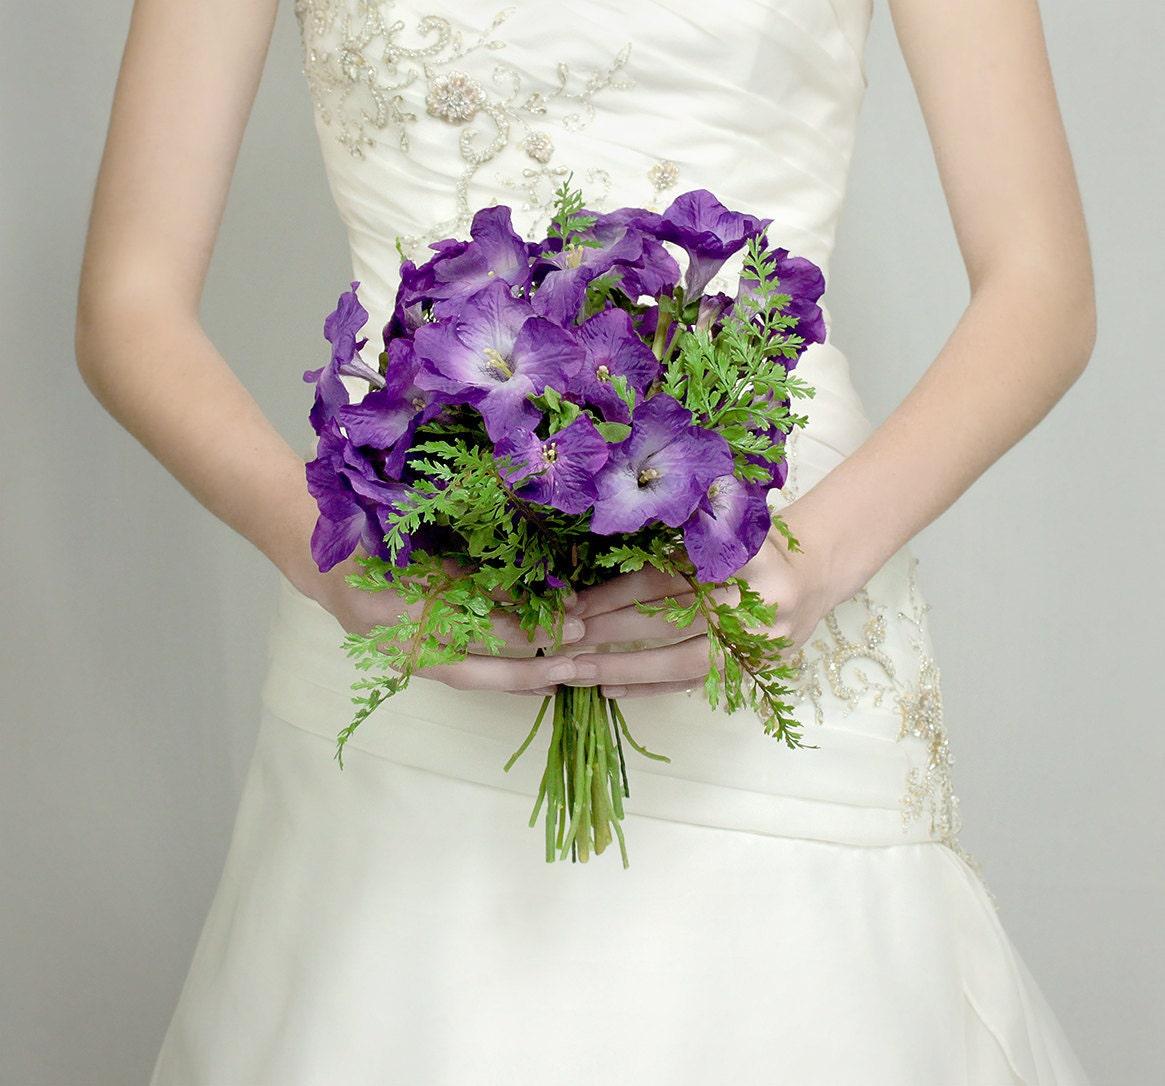 Purple Flower Wedding: Wedding Flowers Bridal Bouquet Of Purple Wedding Flowers